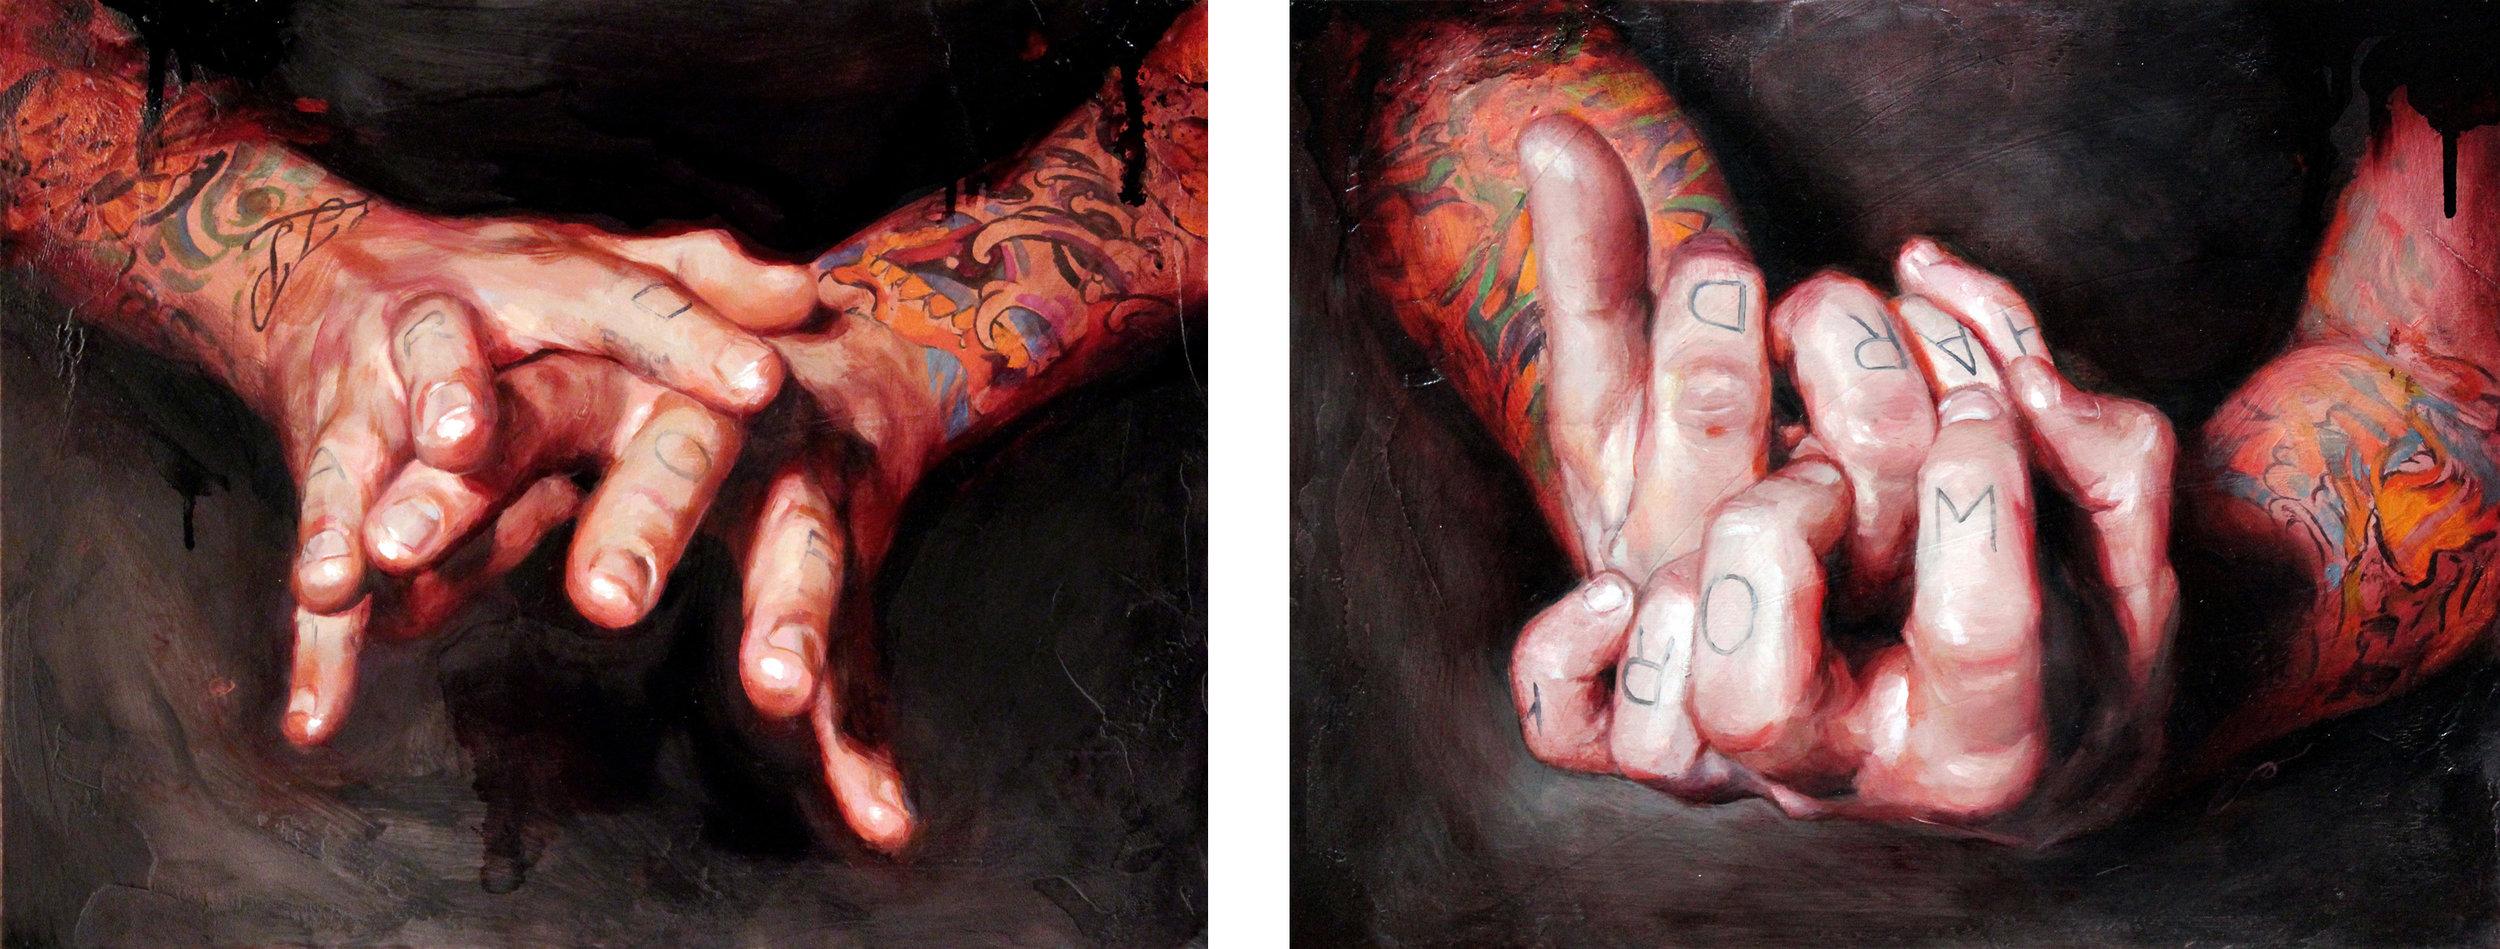 "'Self Portrait, Hand Series 1', oil on panel, 11"" x 14"", Collection of Carl Niendorff / 'Self Portrait, Hand Series 4', oil on panel, 11"" x 14"", Collection of David Benitez / 2010"